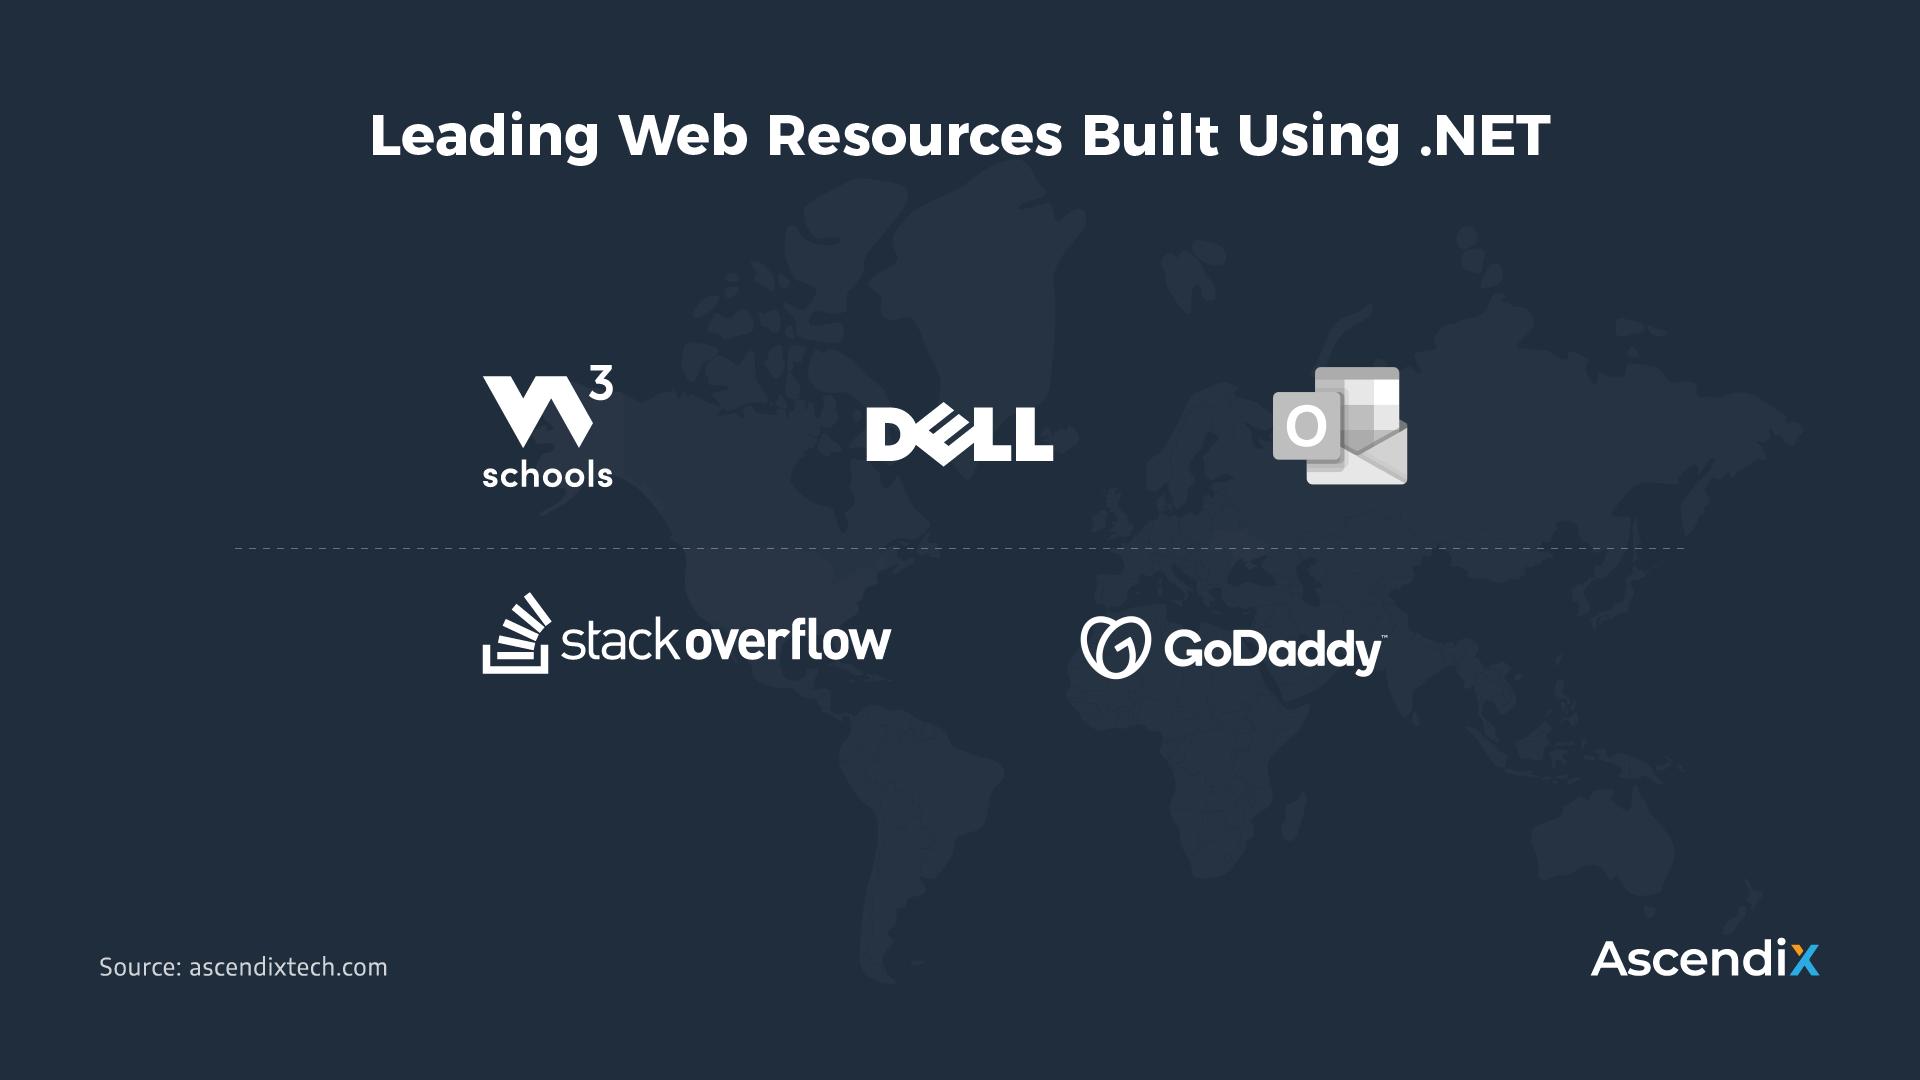 Leading Web Resources Built Using .NET